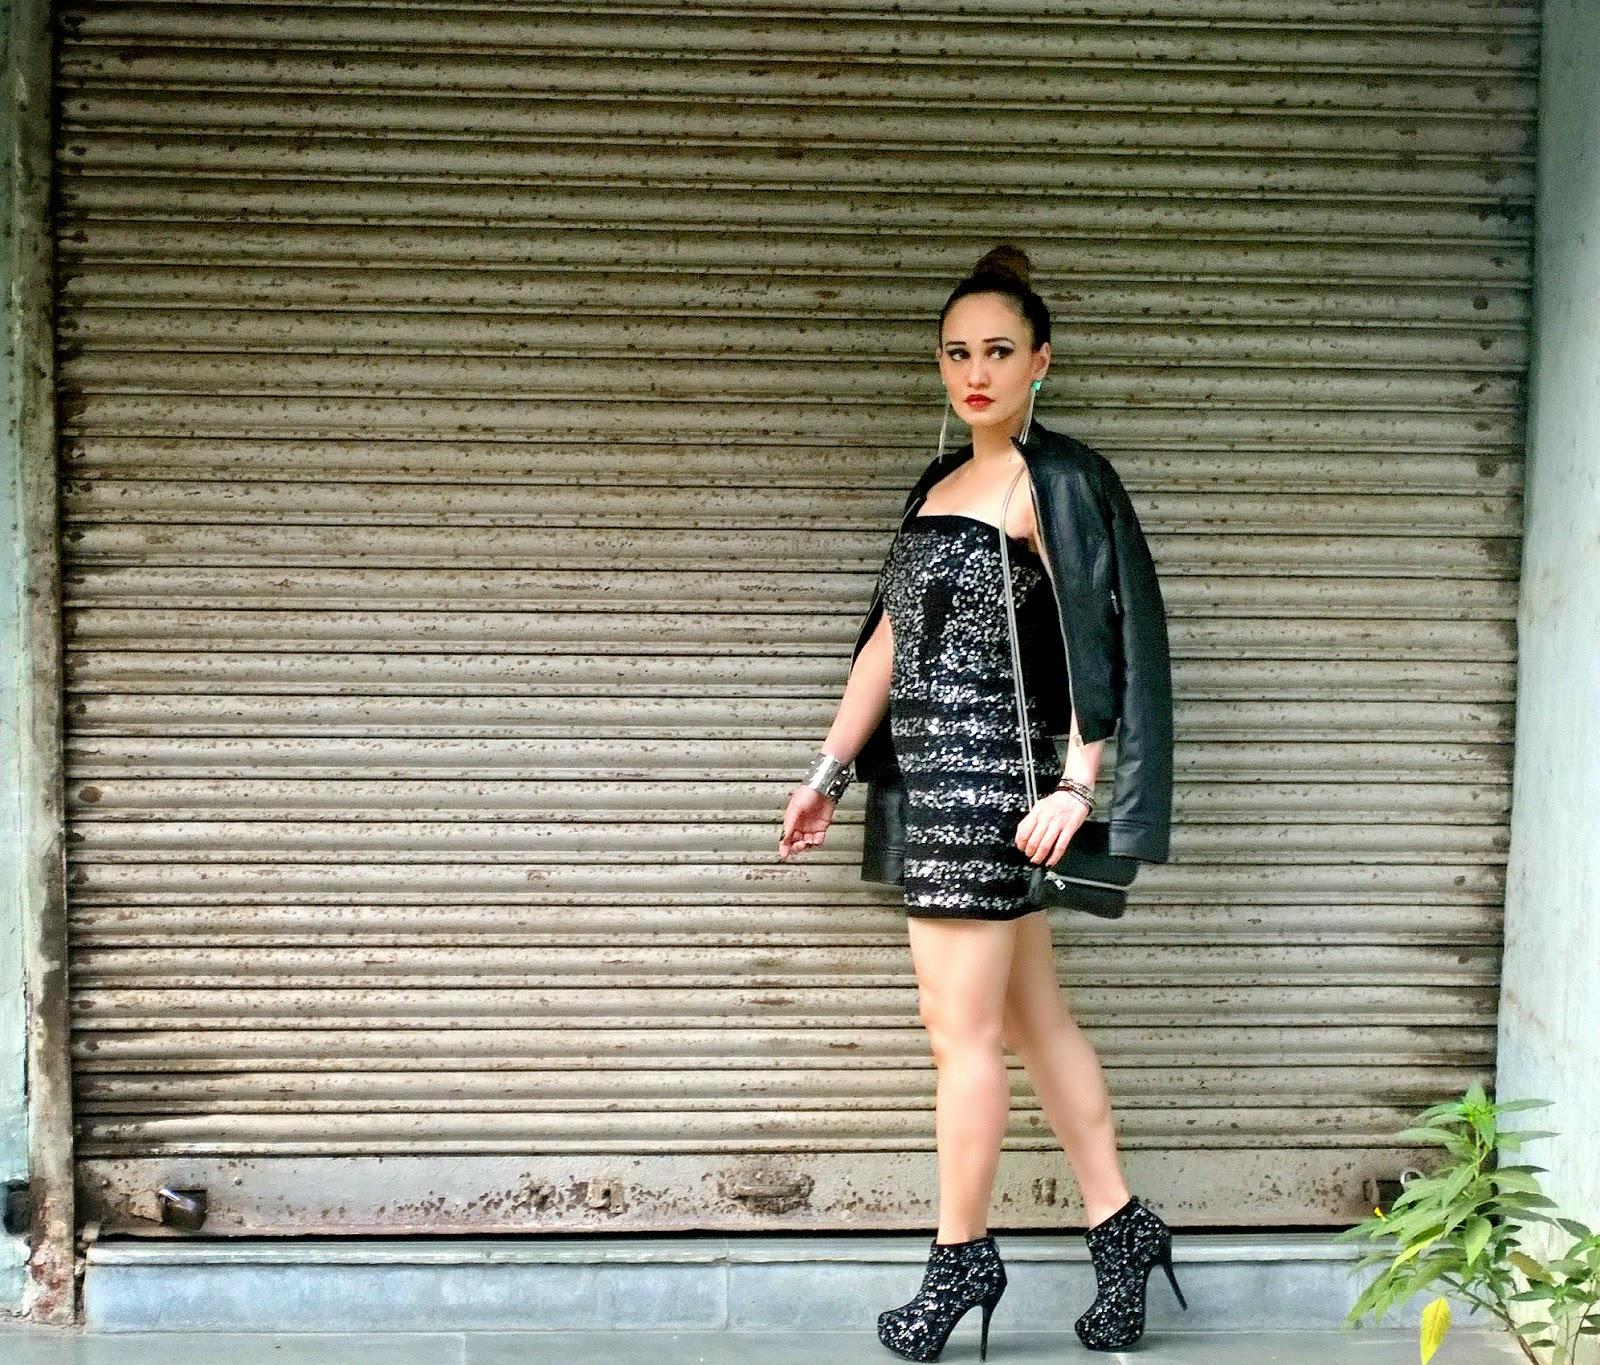 Sequin Dress by Vero Moda Marquee by Karan Johar